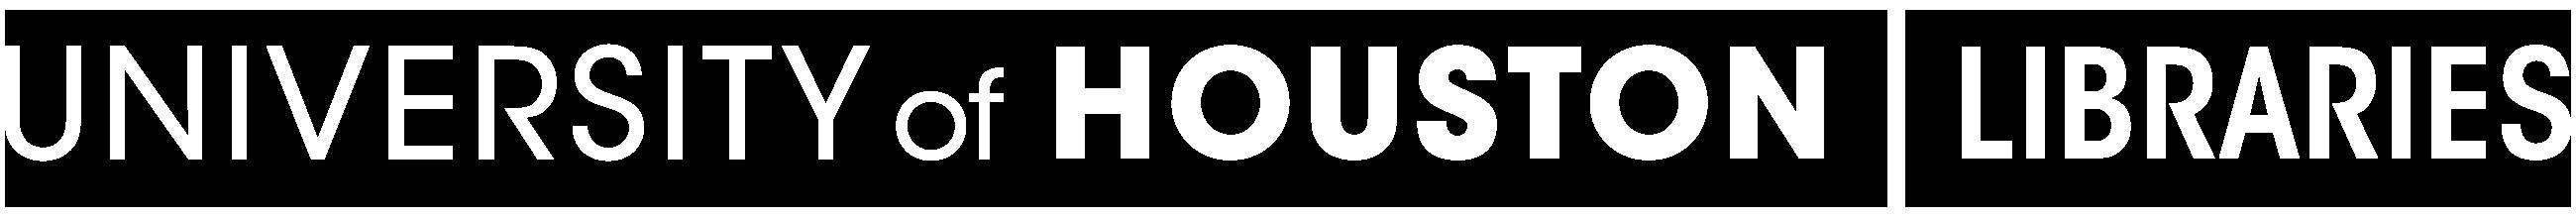 UH Libraries logo